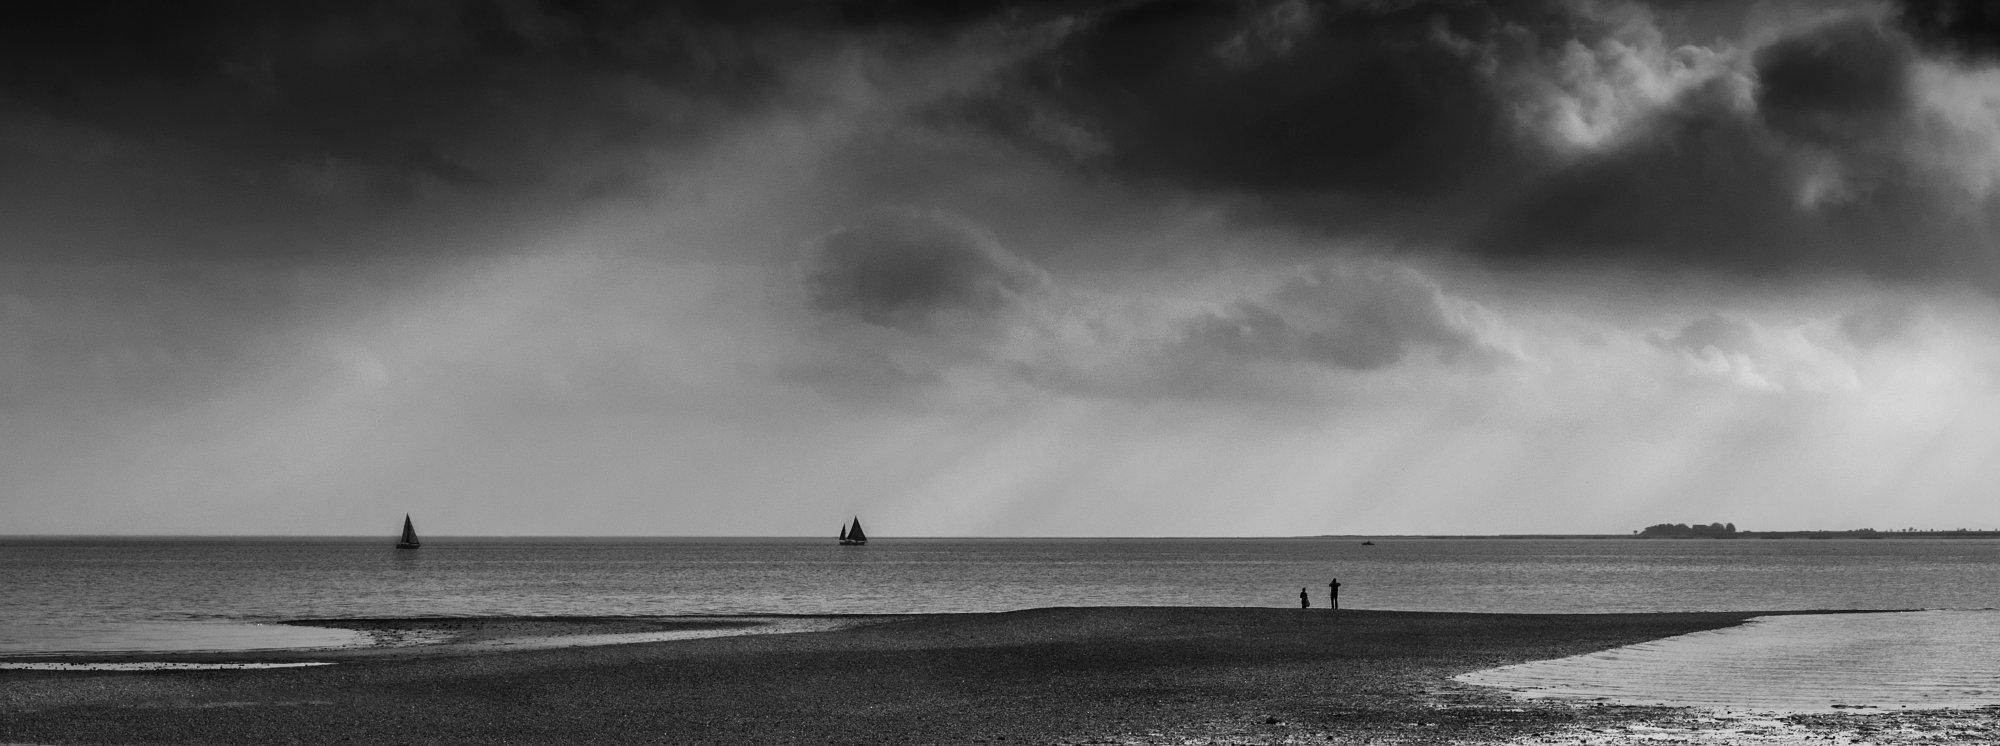 Sunset at Mersea Island in Essex.